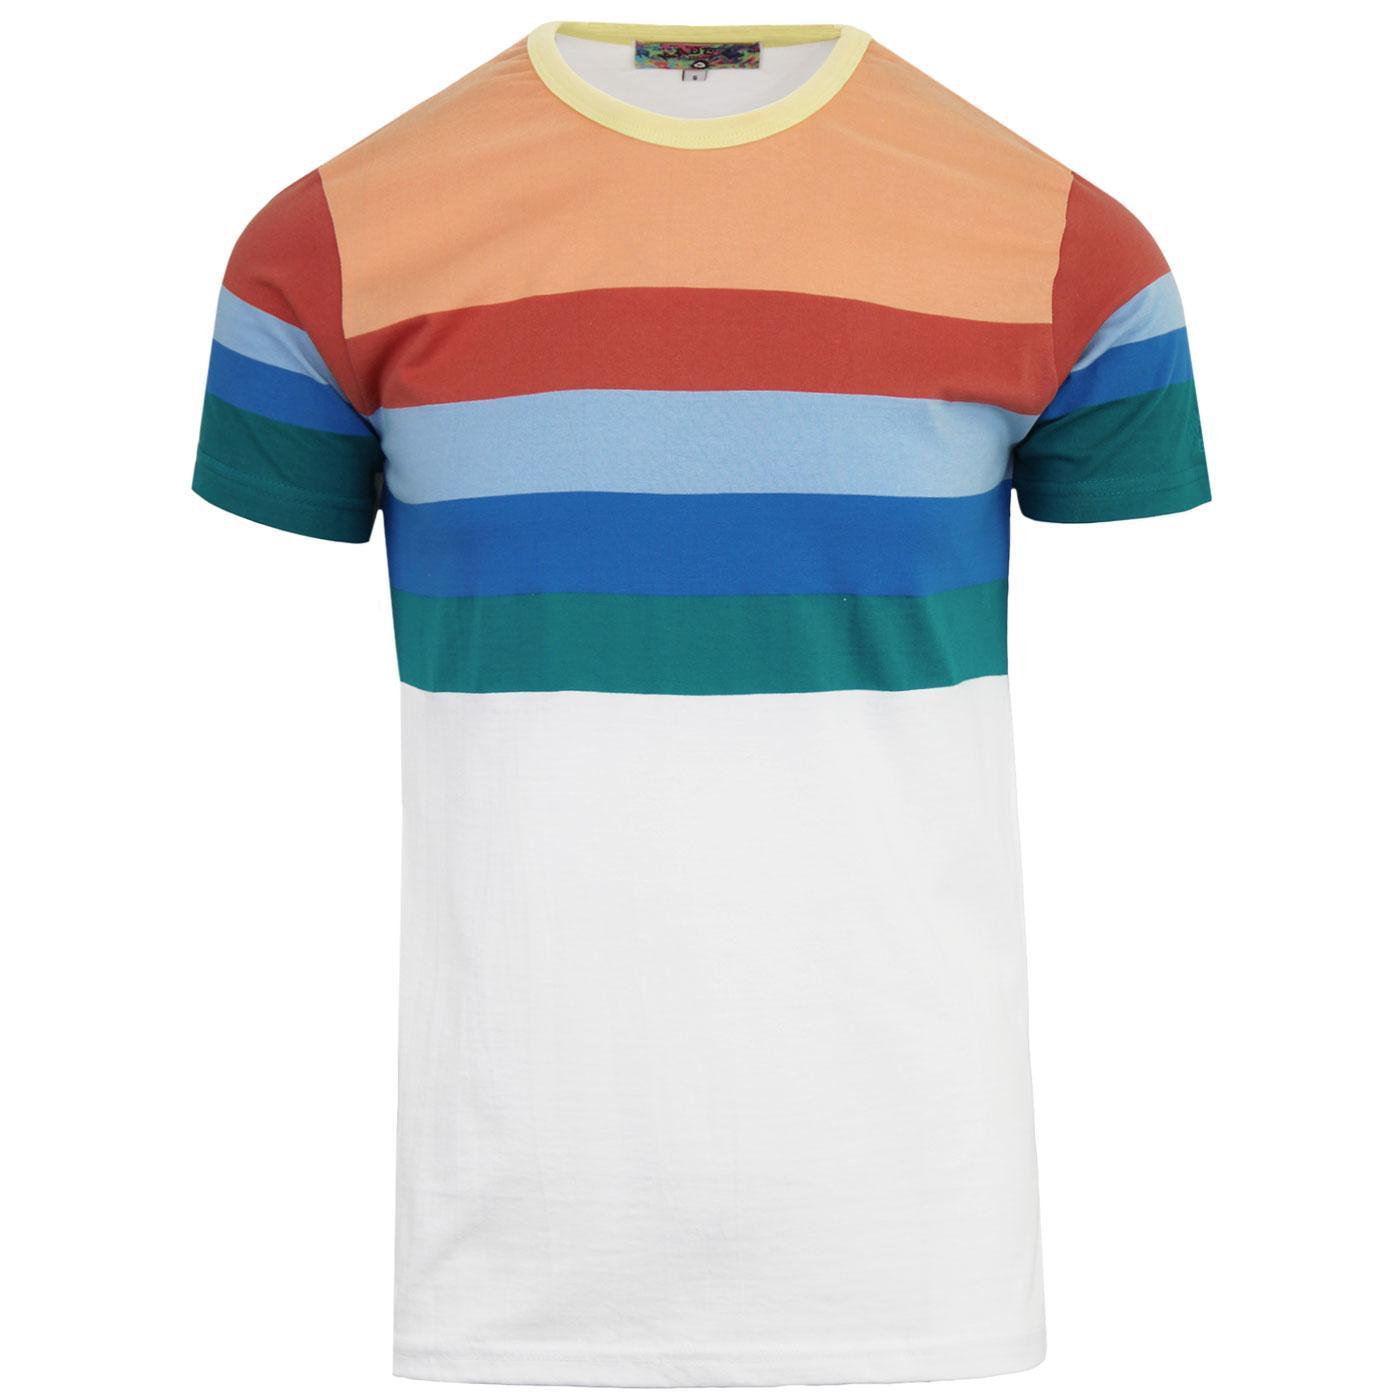 Zippo MADCAP ENGLAND Retro 70s Rainbow Stripe Tee